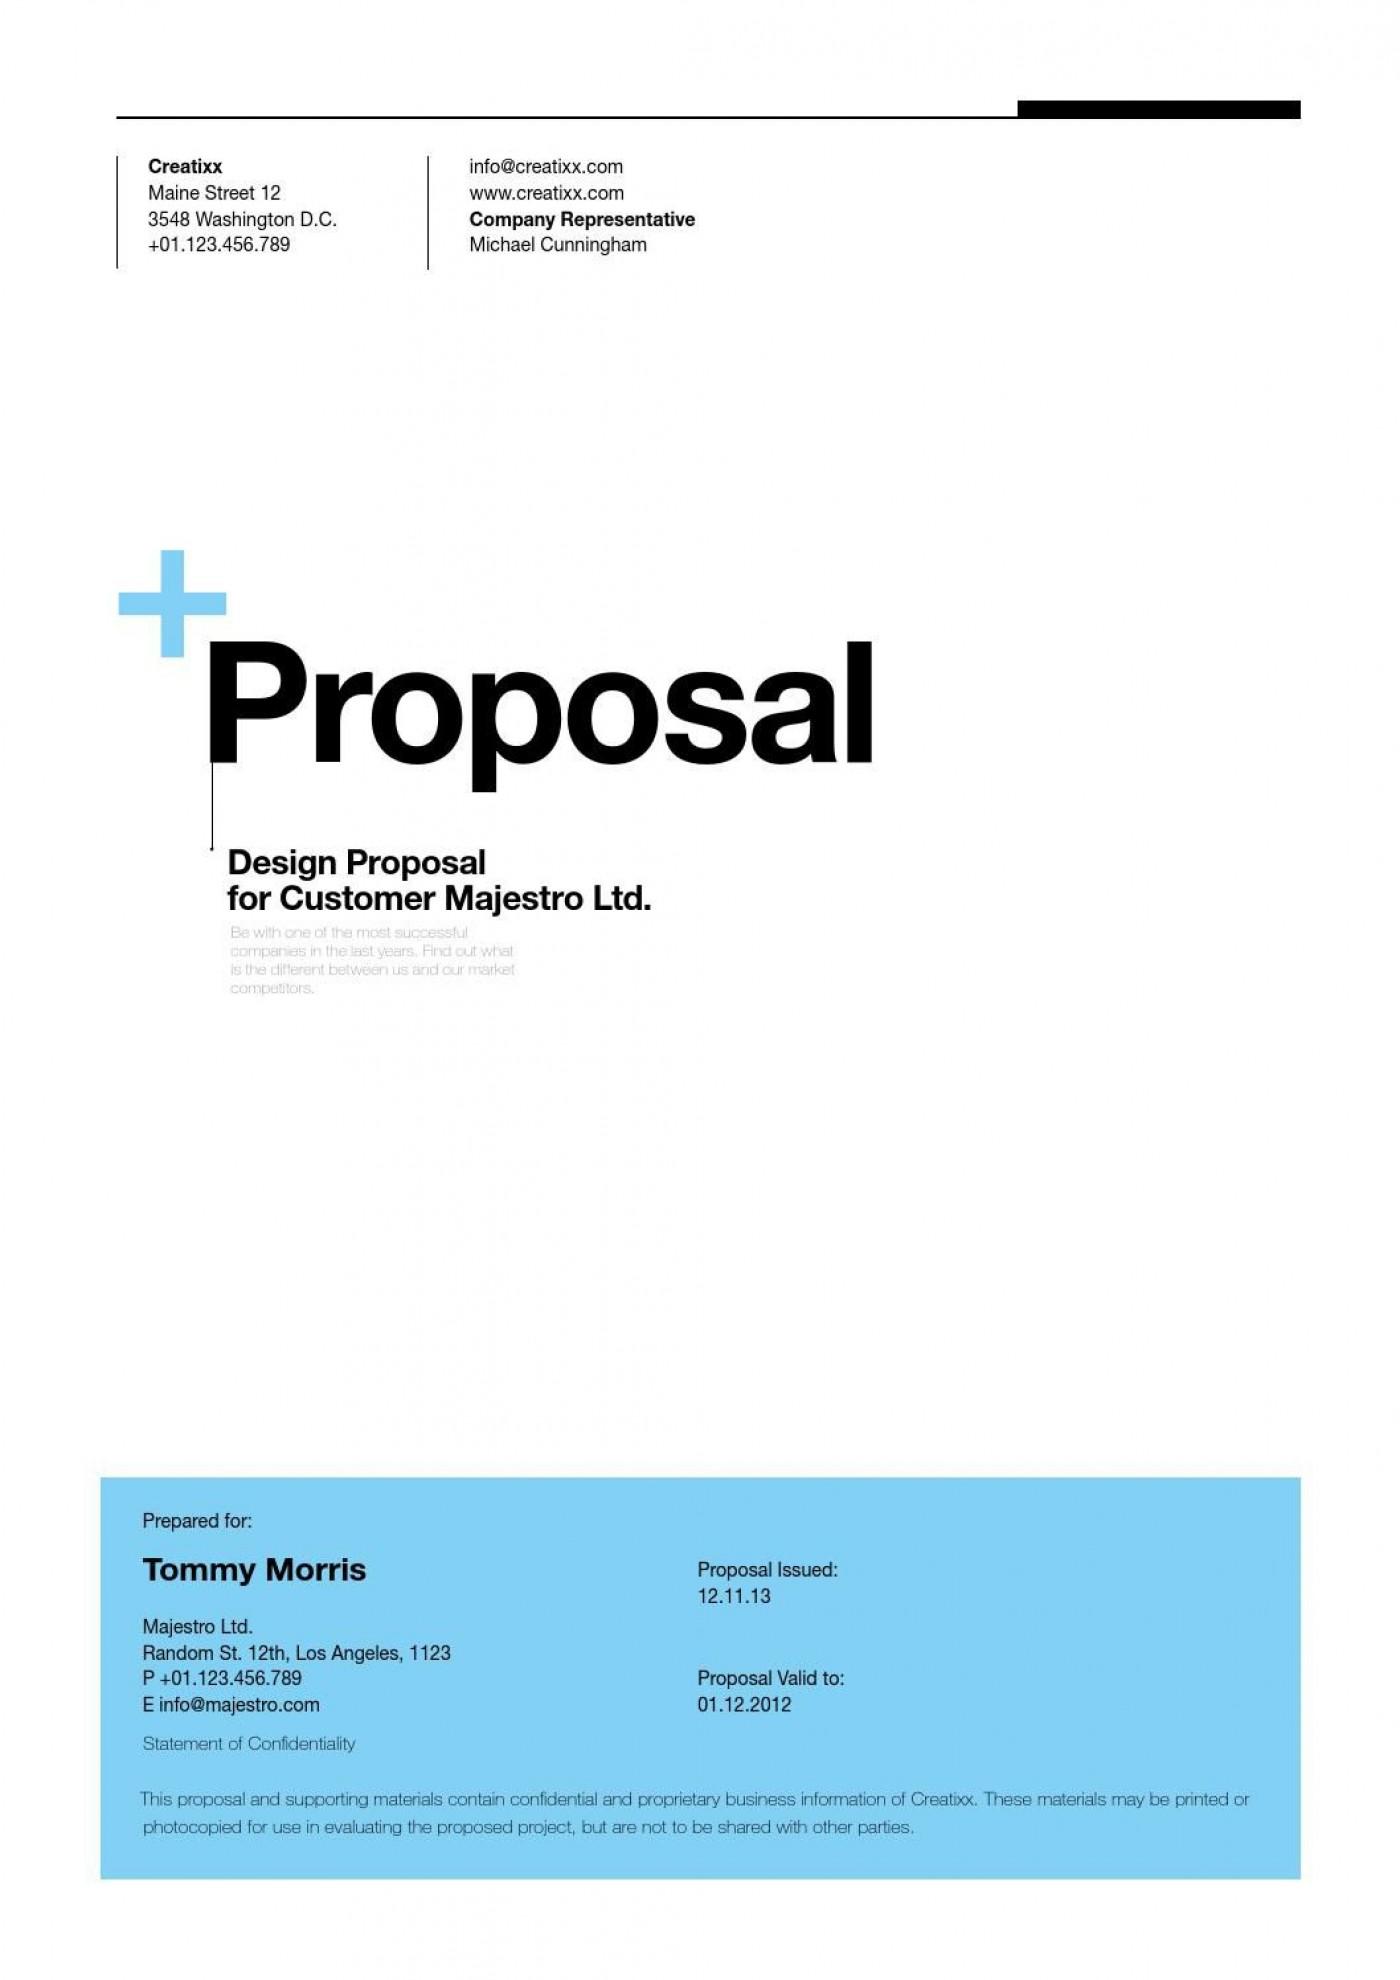 004 Surprising Web Development Proposal Template Free Concept 1400